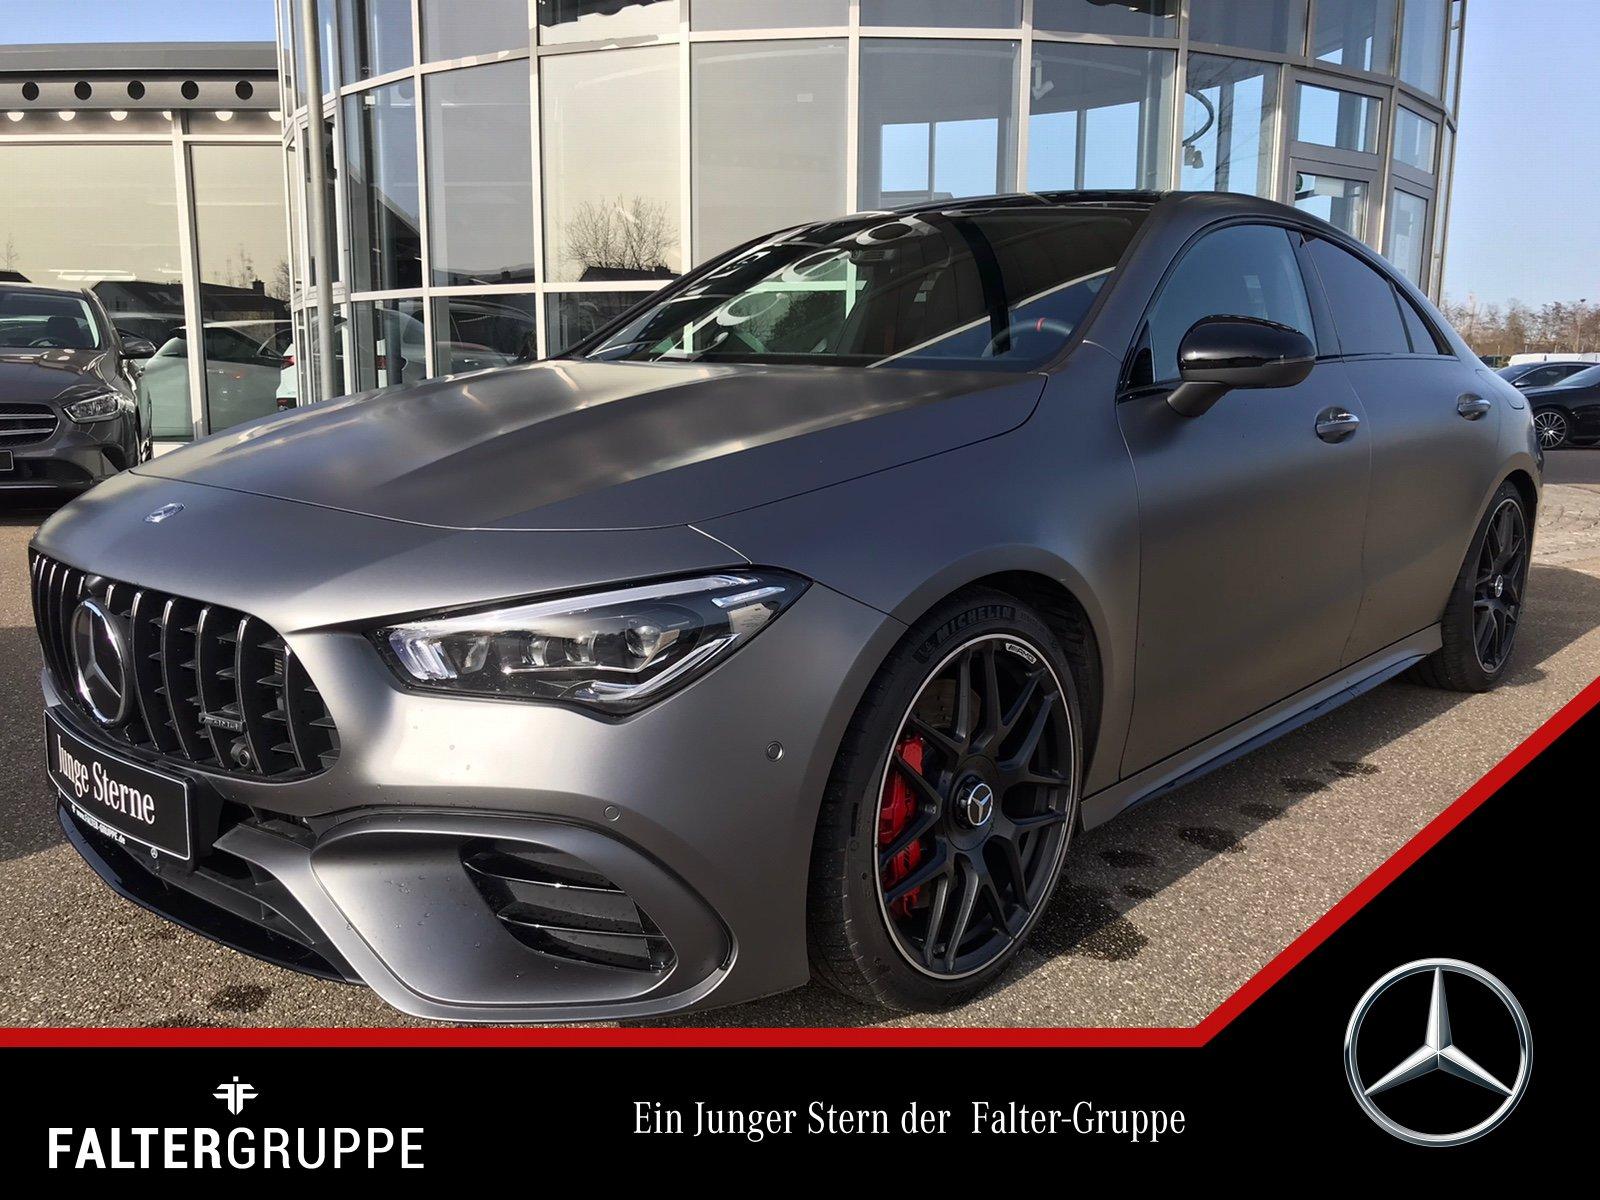 Mercedes-Benz CLA 45 88.970,-MAGNO Perf.Sitze DYNAMIC+ DISTRO, Jahr 2020, Benzin